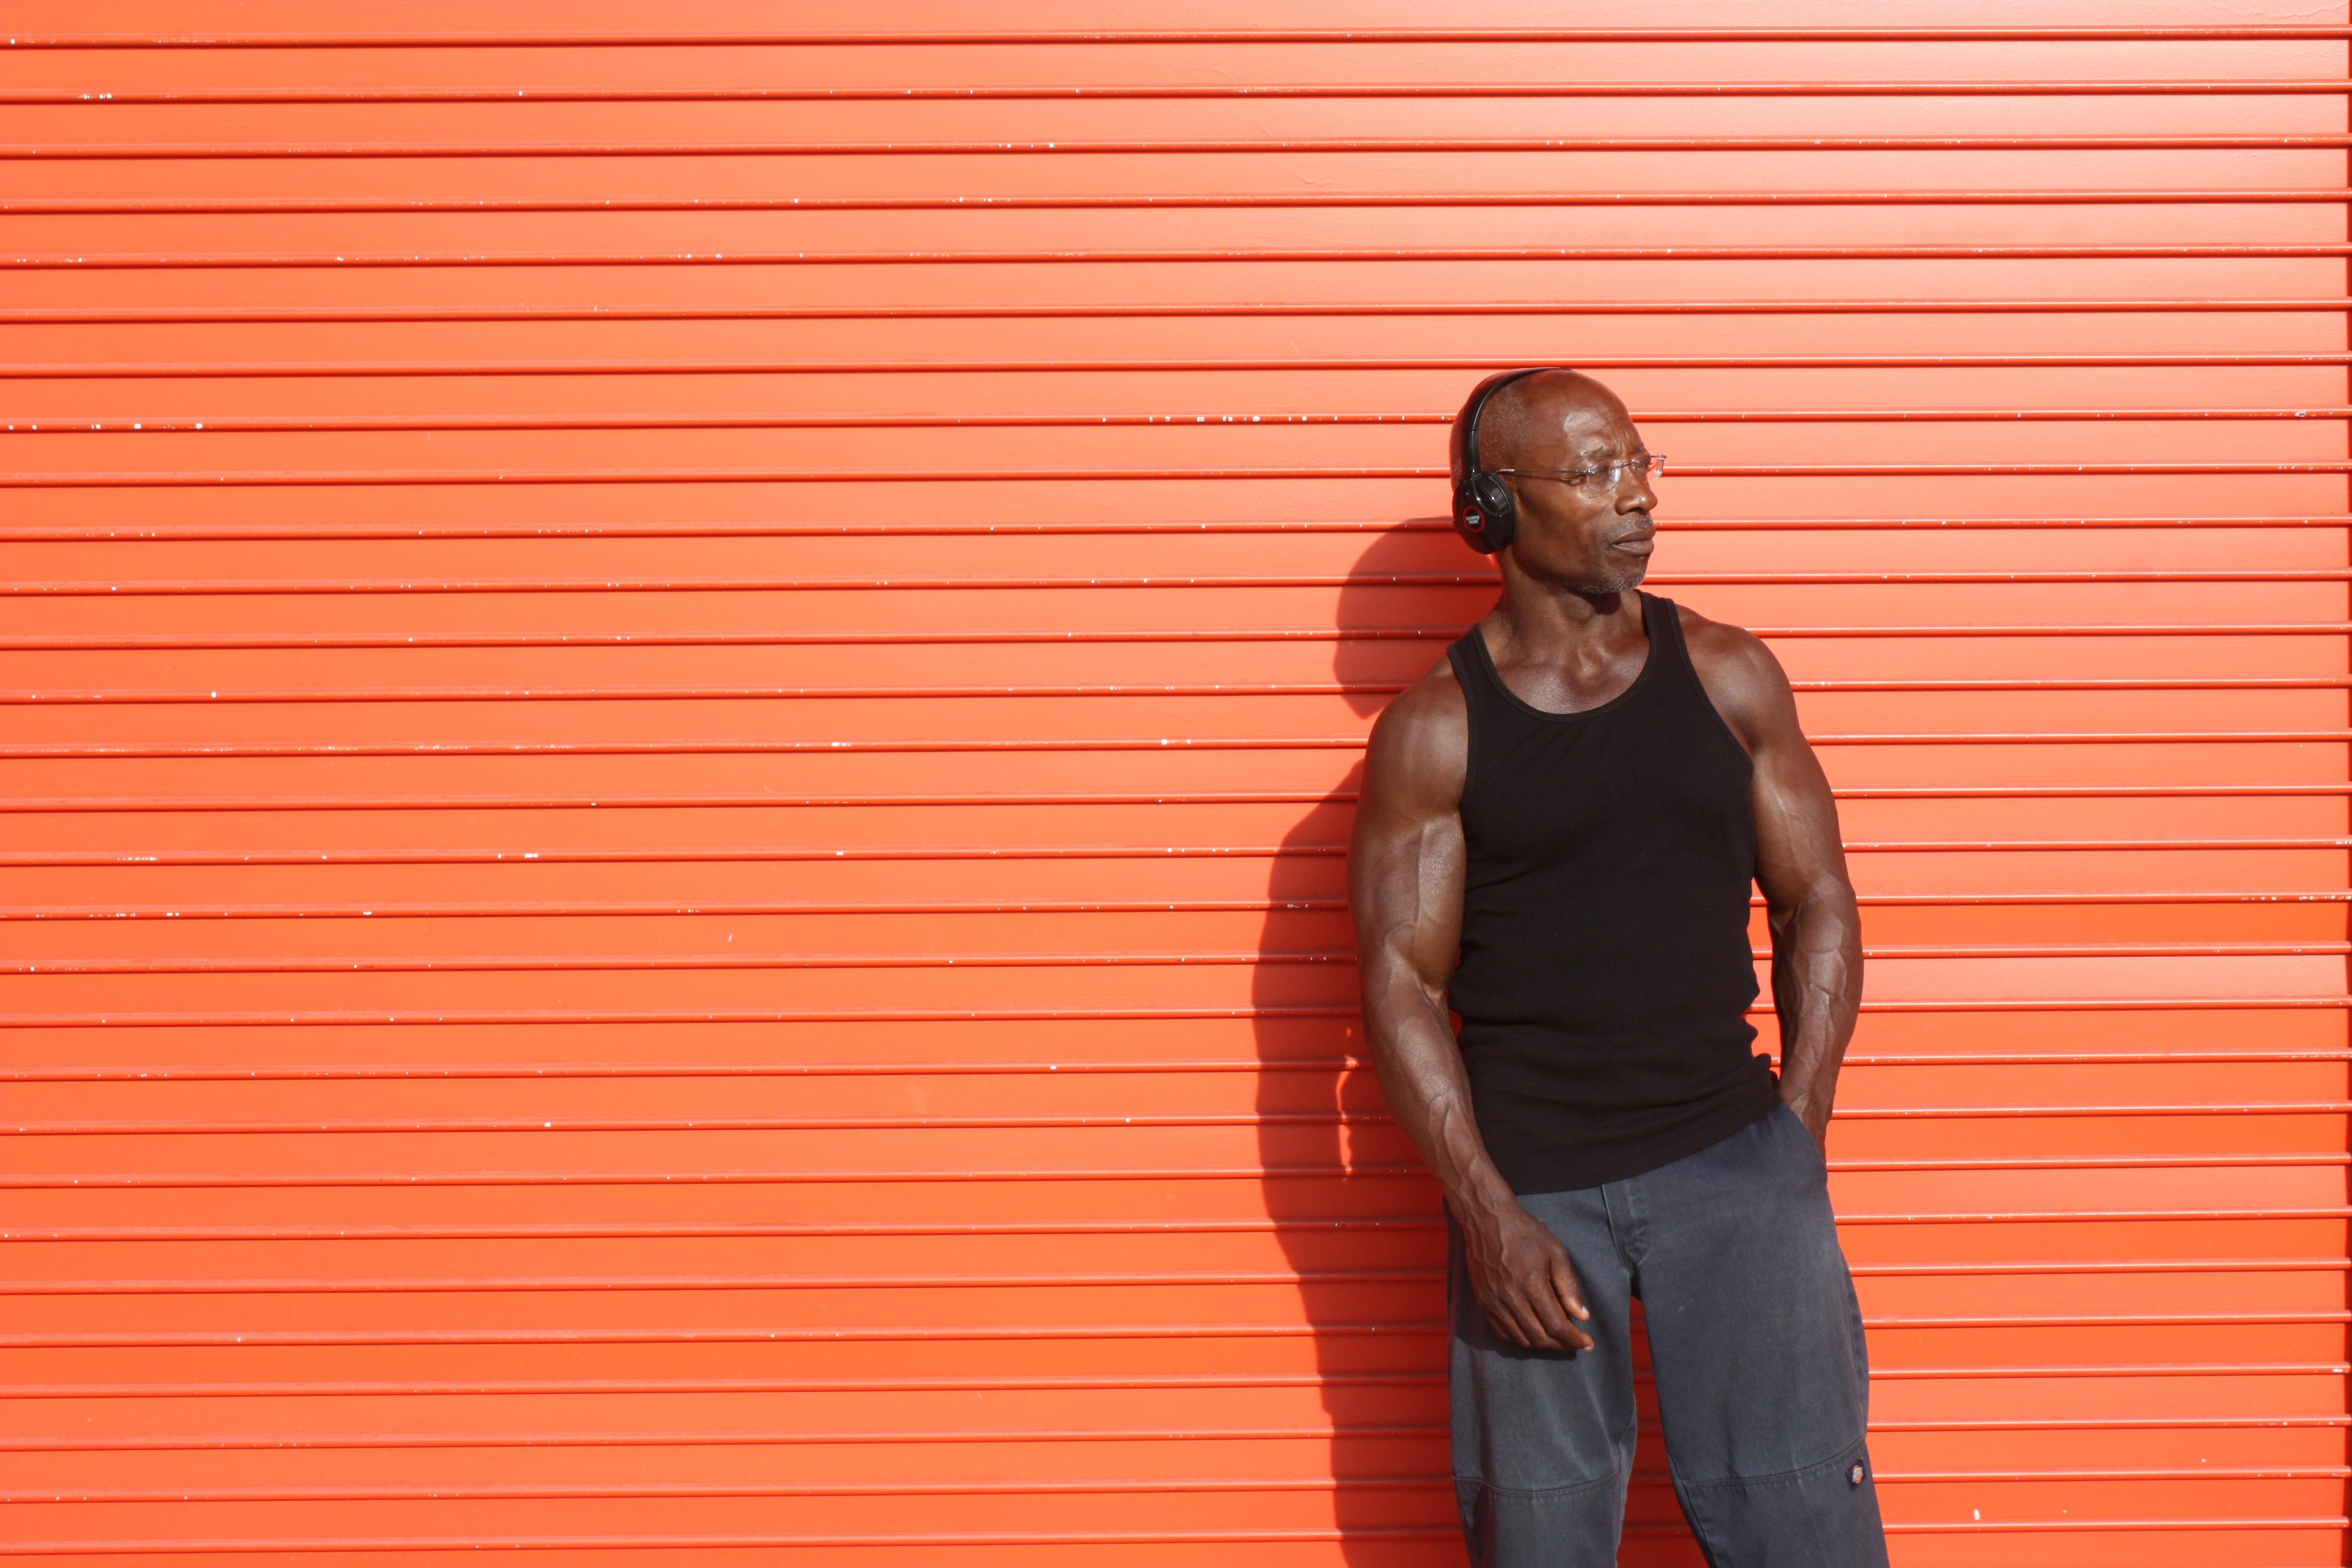 Kostenlose foto : rot, Farbe, Muskel, Menschliche Positionen ...